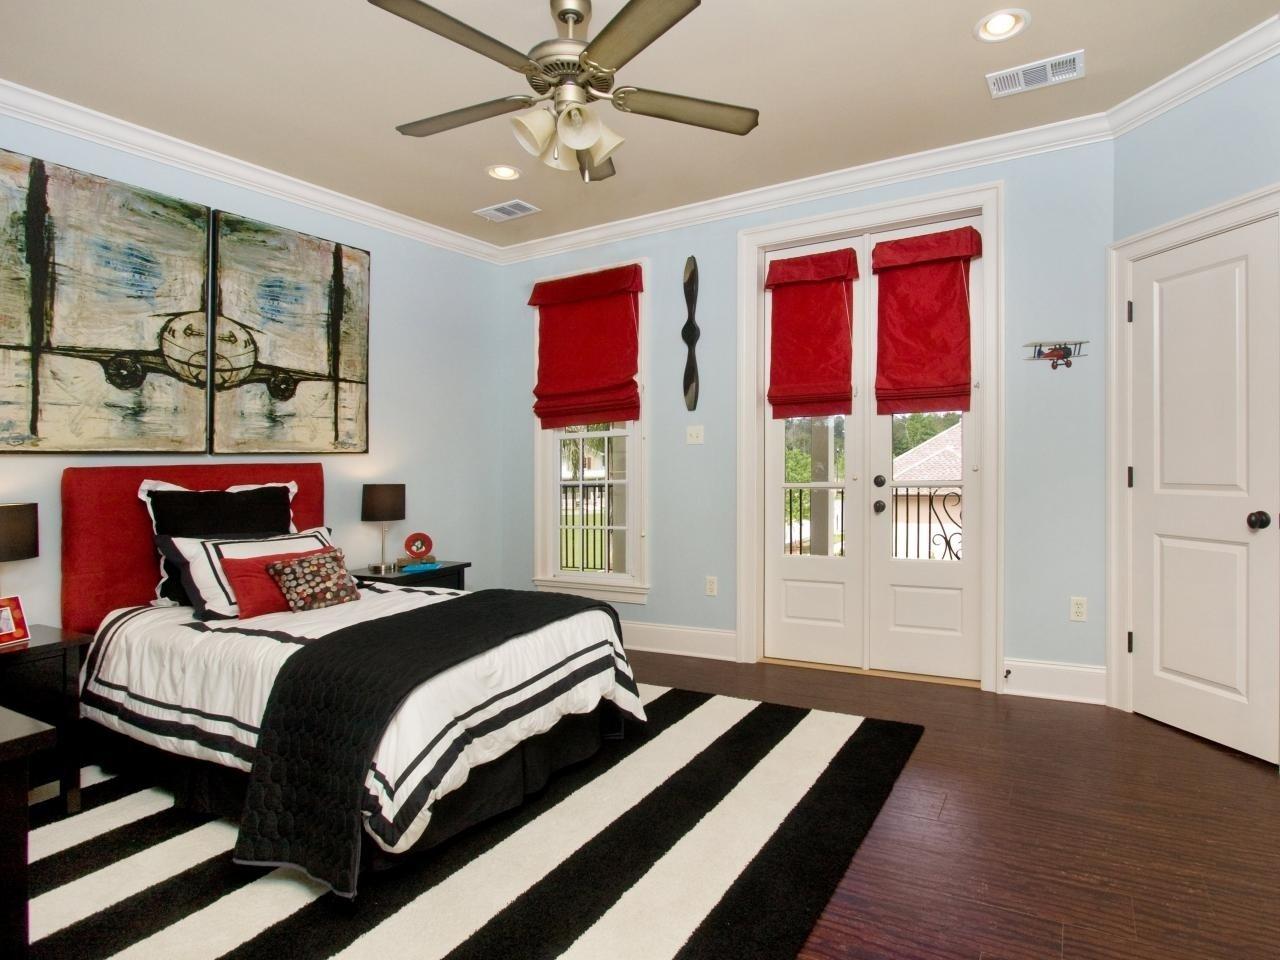 10 Cute Red Black And White Room Ideas brilliant red black and white bedroom accessories 49 in 2020